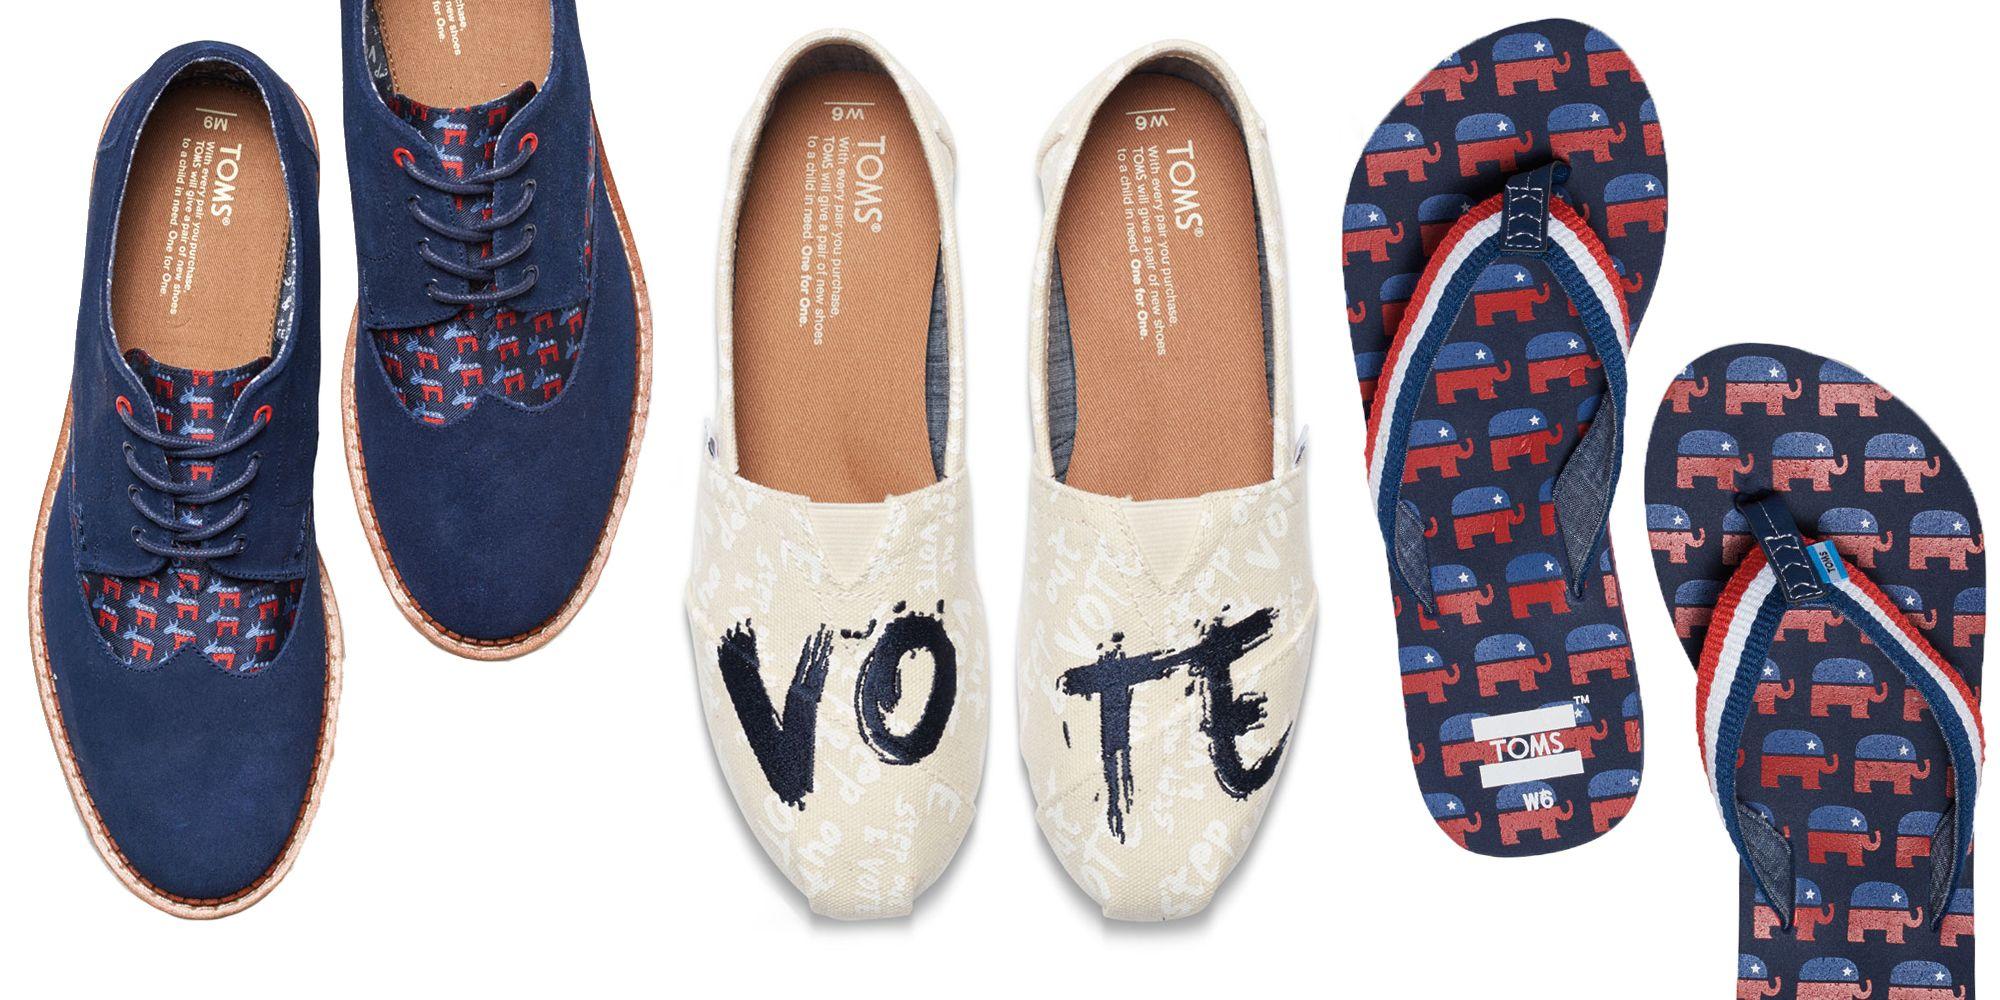 80d79ed1e5e Rock the Vote x TOMS Election Collaboration 2018